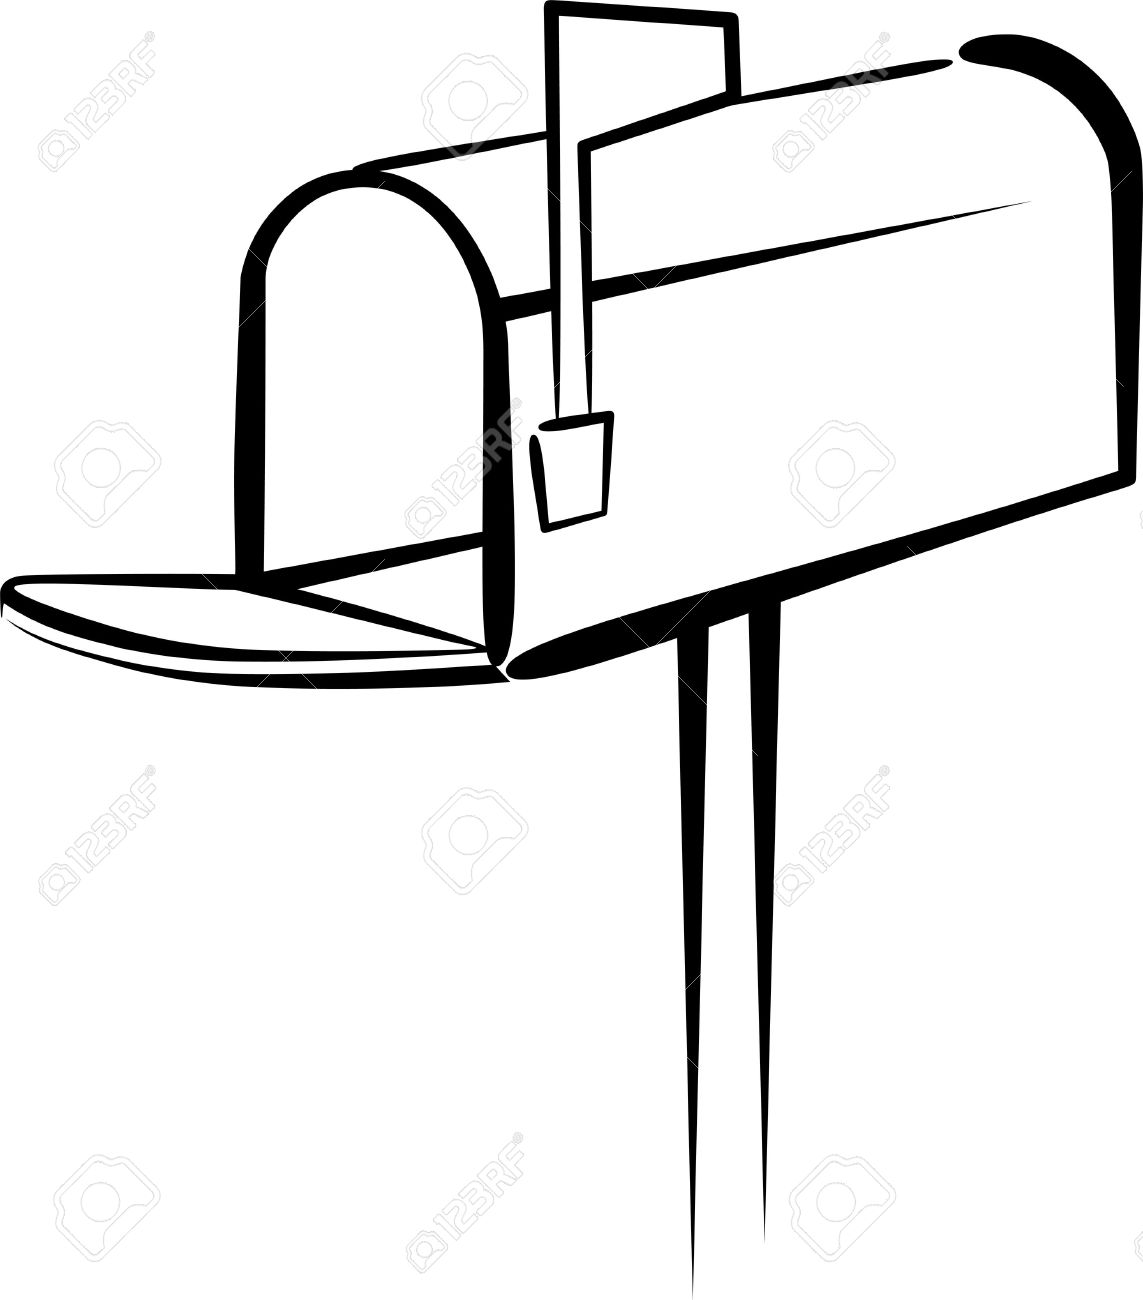 Mail box clipart.